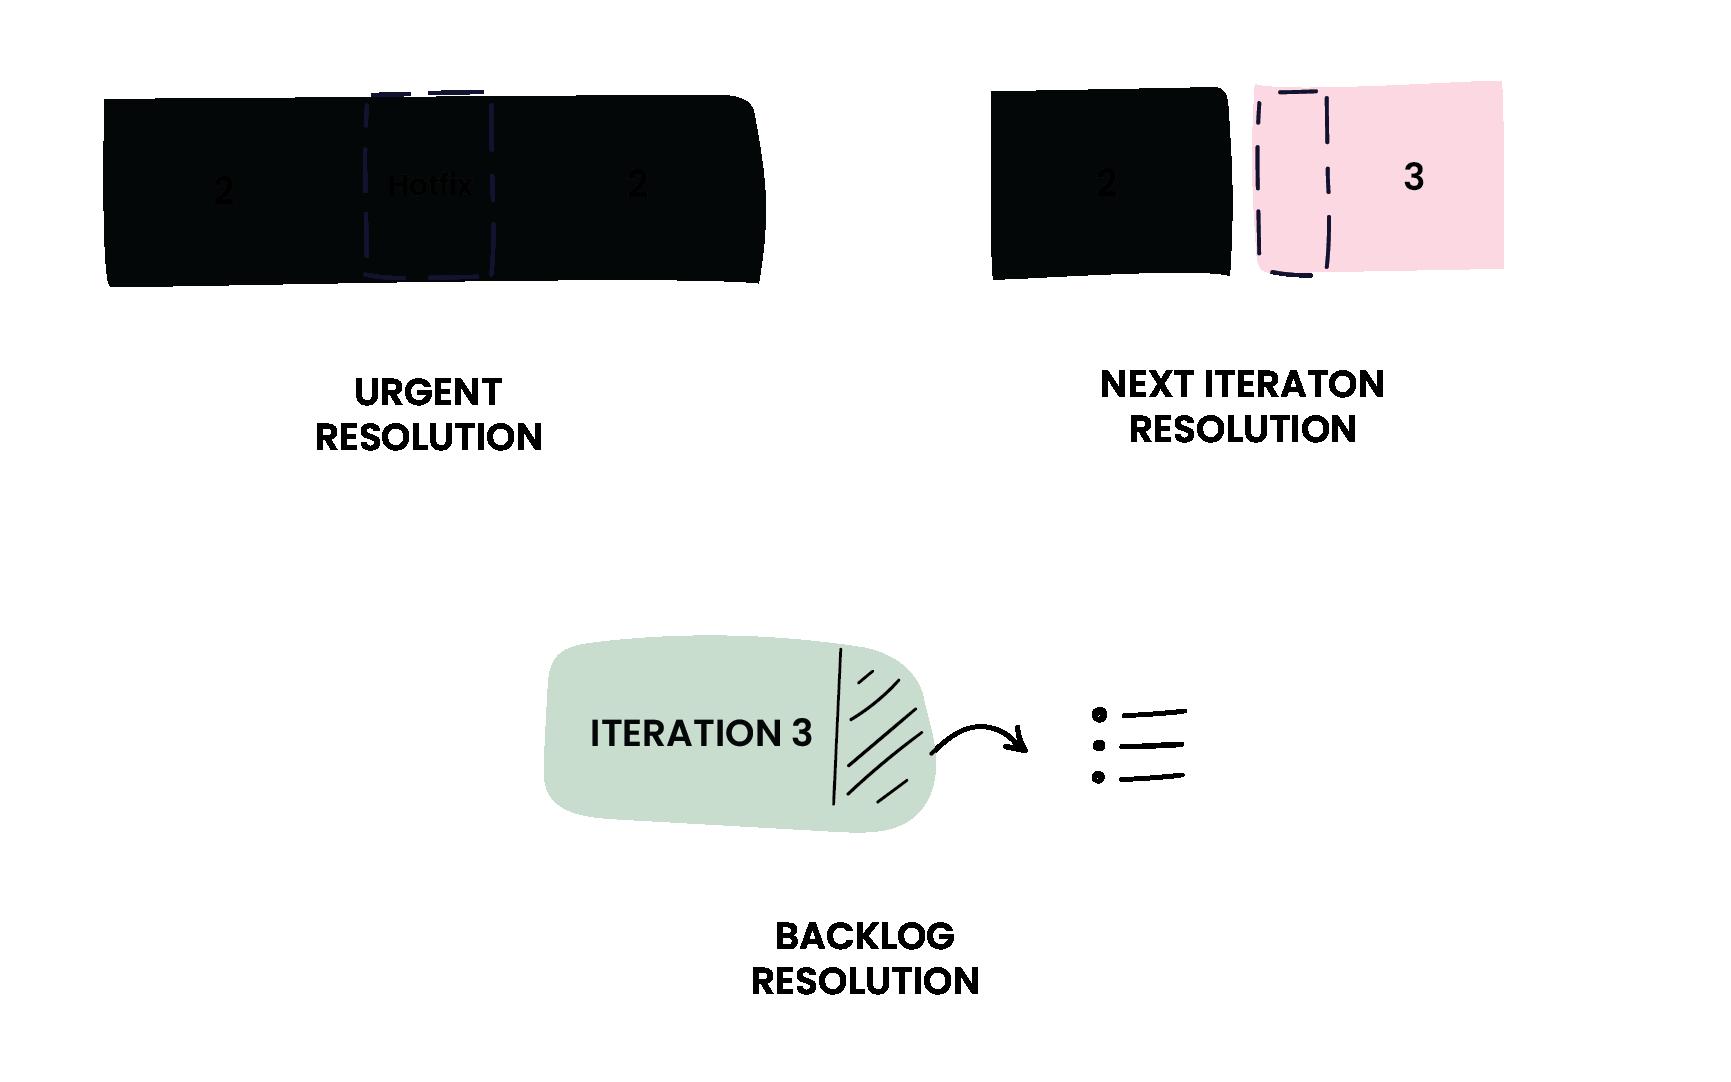 Iteration backlog infographic